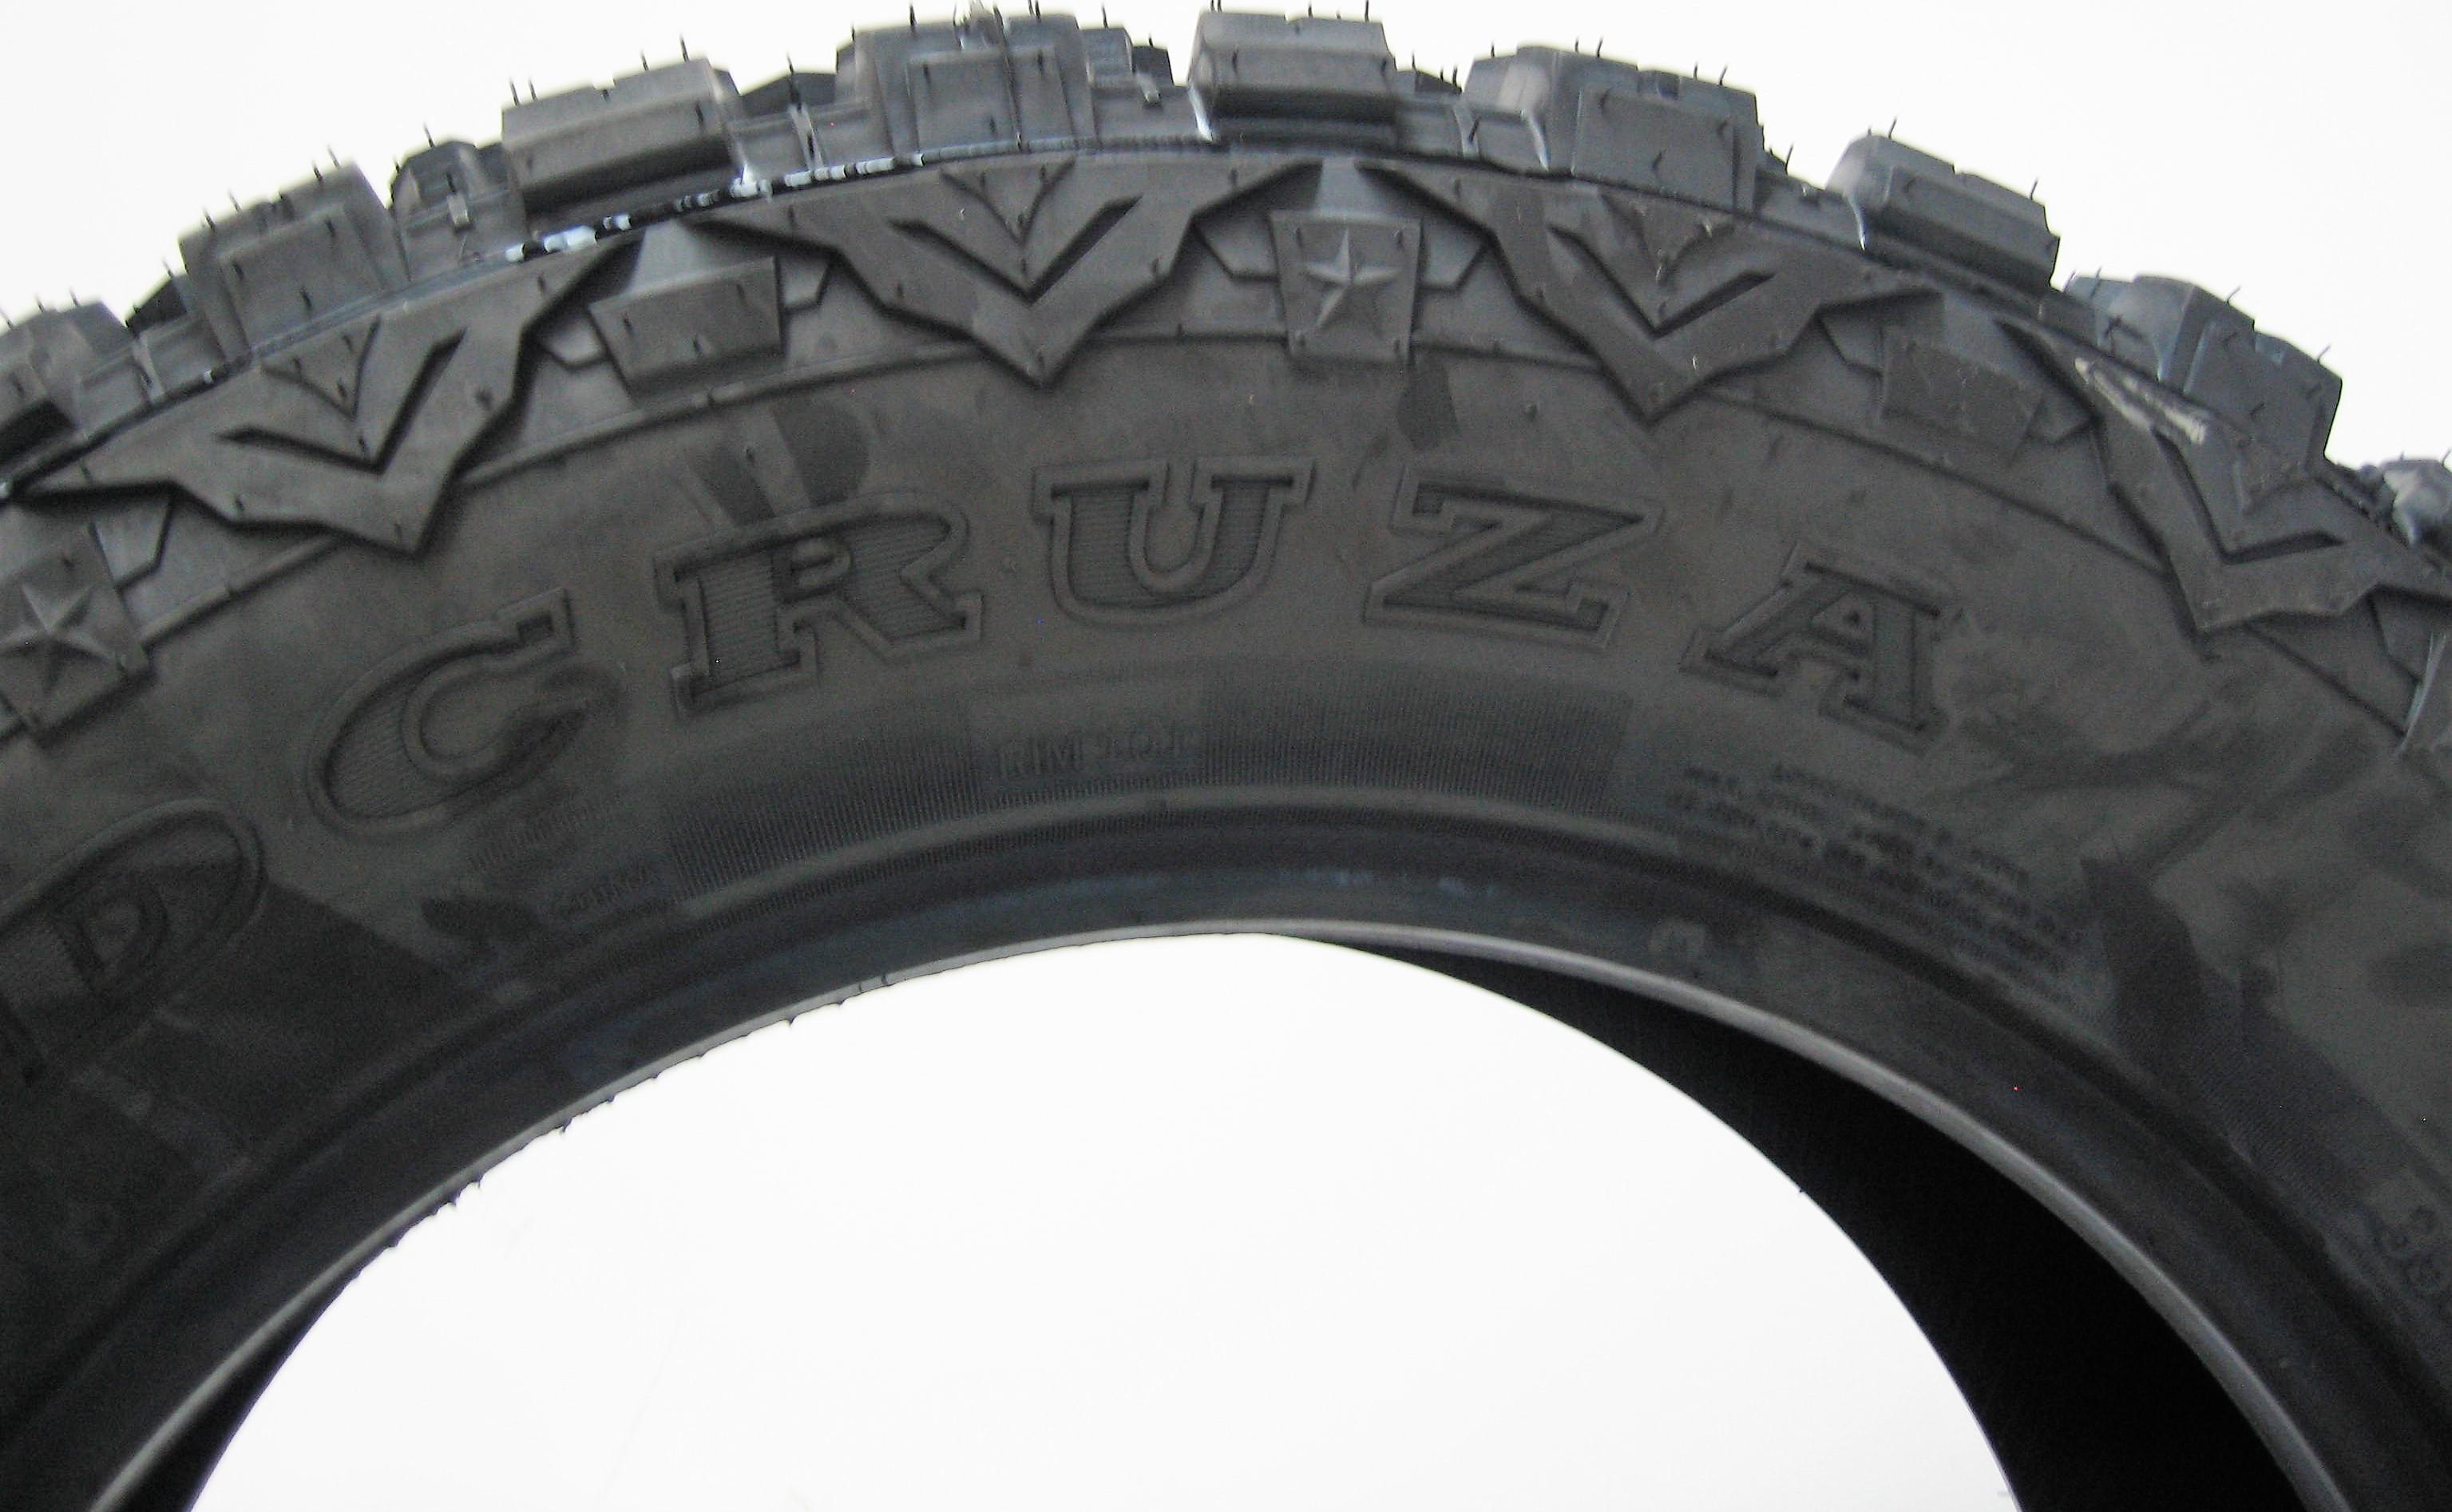 10 pli roadcruza ra3200 m t mud terrain pneu 4 saison homologu pour l 39 hiver. Black Bedroom Furniture Sets. Home Design Ideas